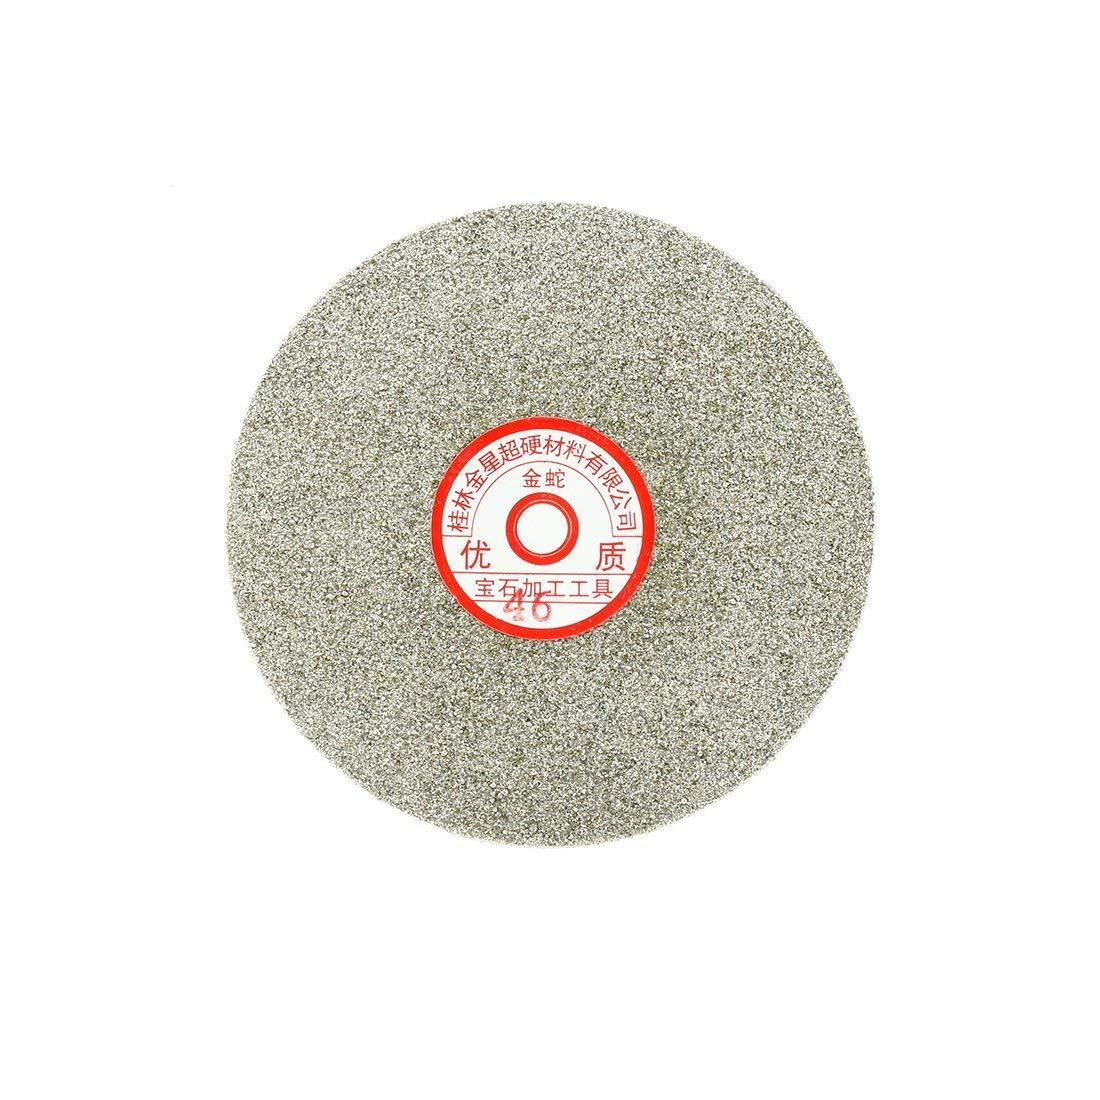 Sourcingmap 6-inch Grit 60 Diamond Coated Flat Lap Wheel Grinding Sanding Polishing Disc